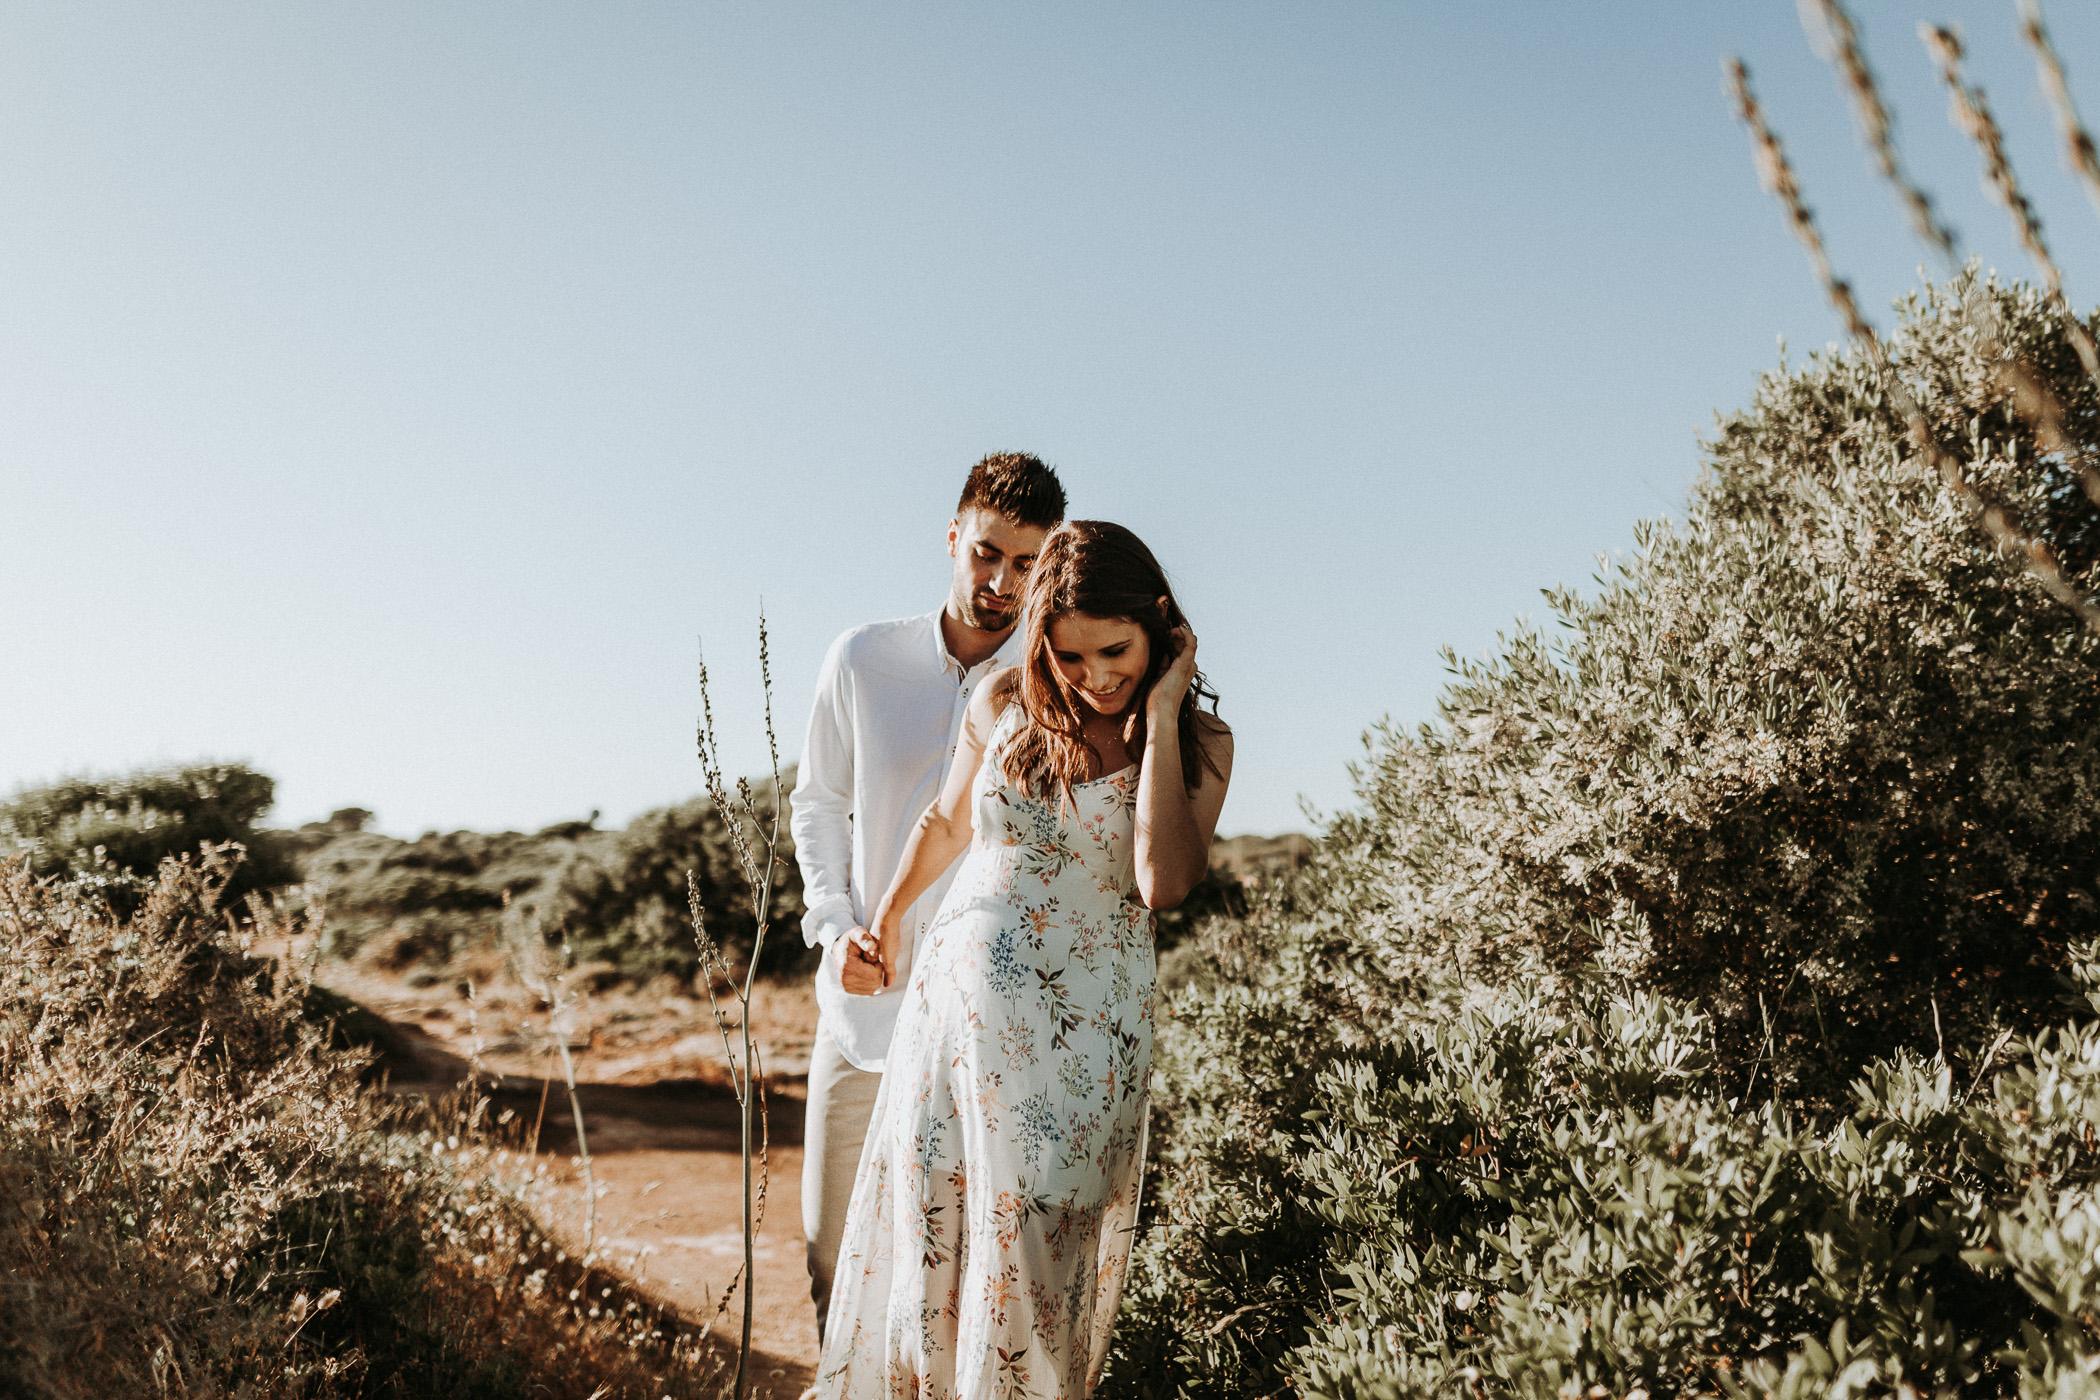 DanielaMarquardtPhotography_wedding_elopement_mallorca_spain_calapi_palma_lauraandtoni_214